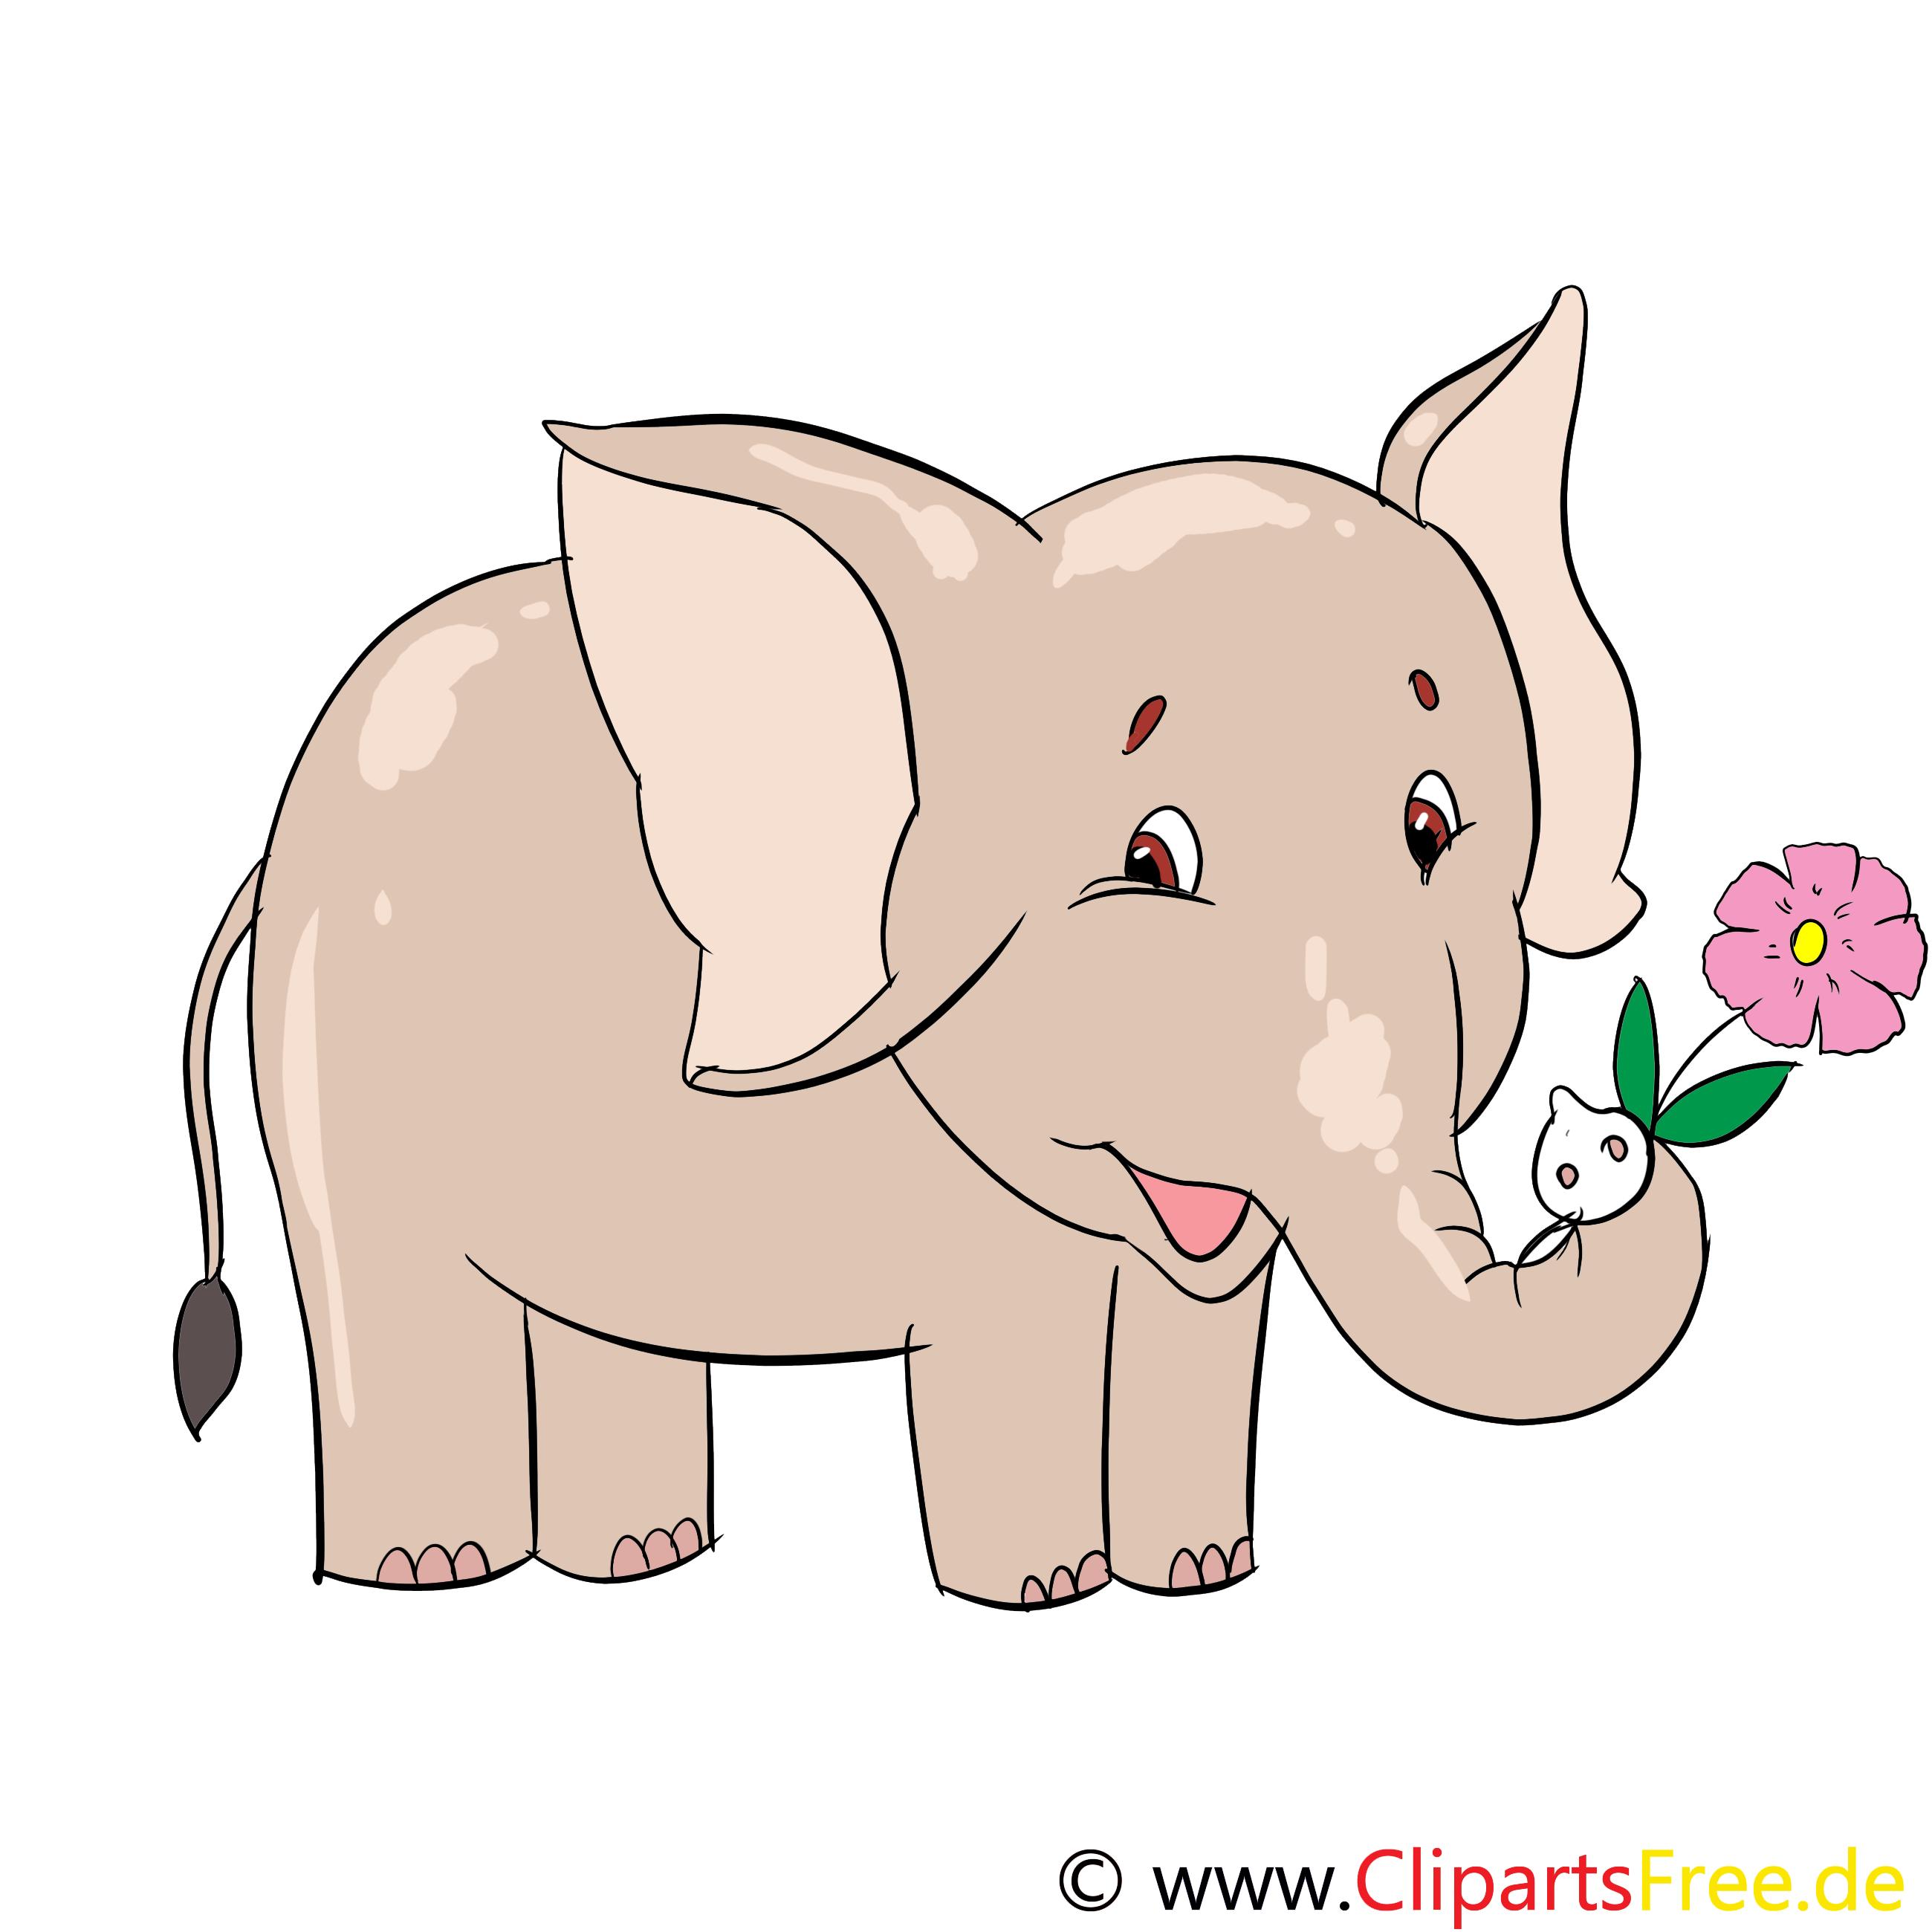 Kleiner Elefant Illustration, Clip Art, Bild, E-Card